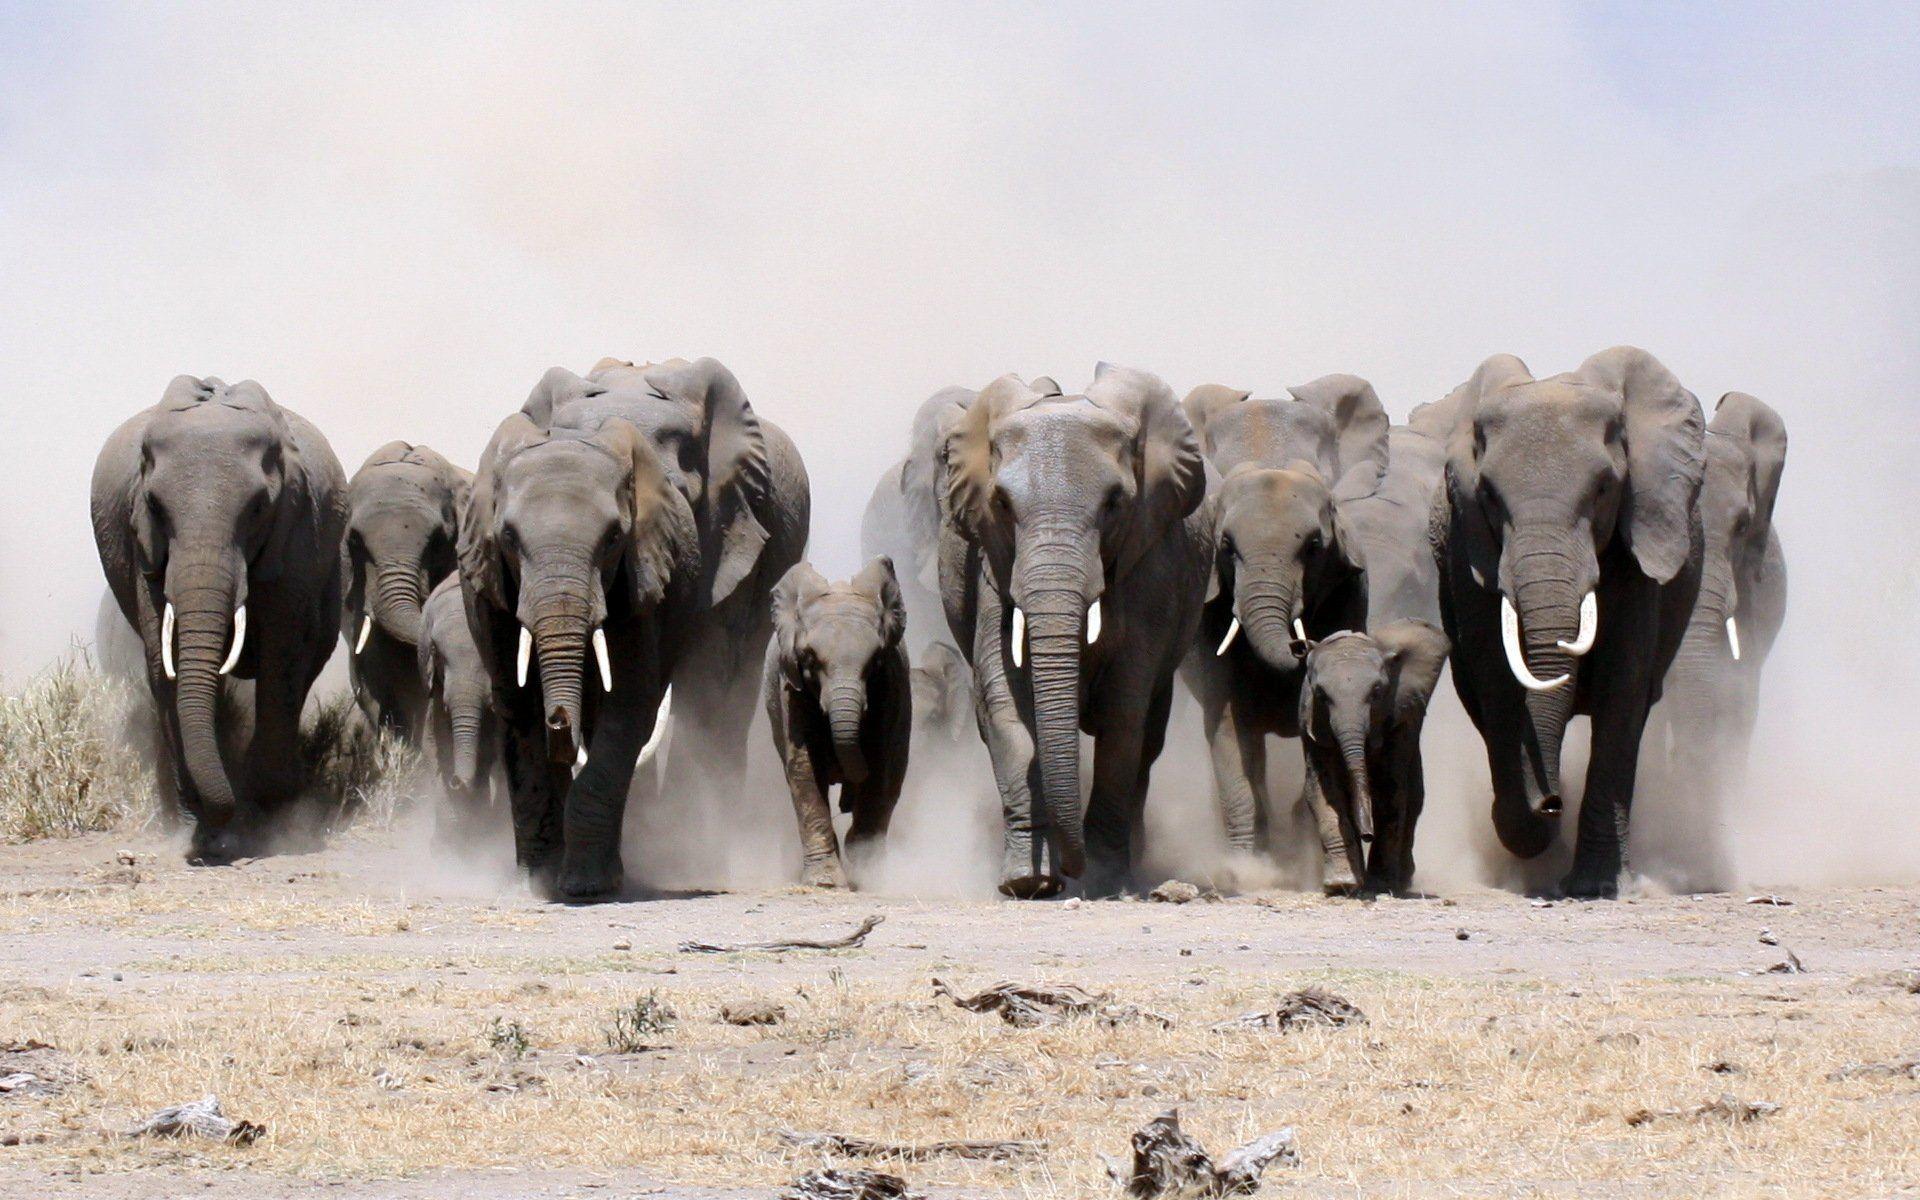 elephant backgrounds hd